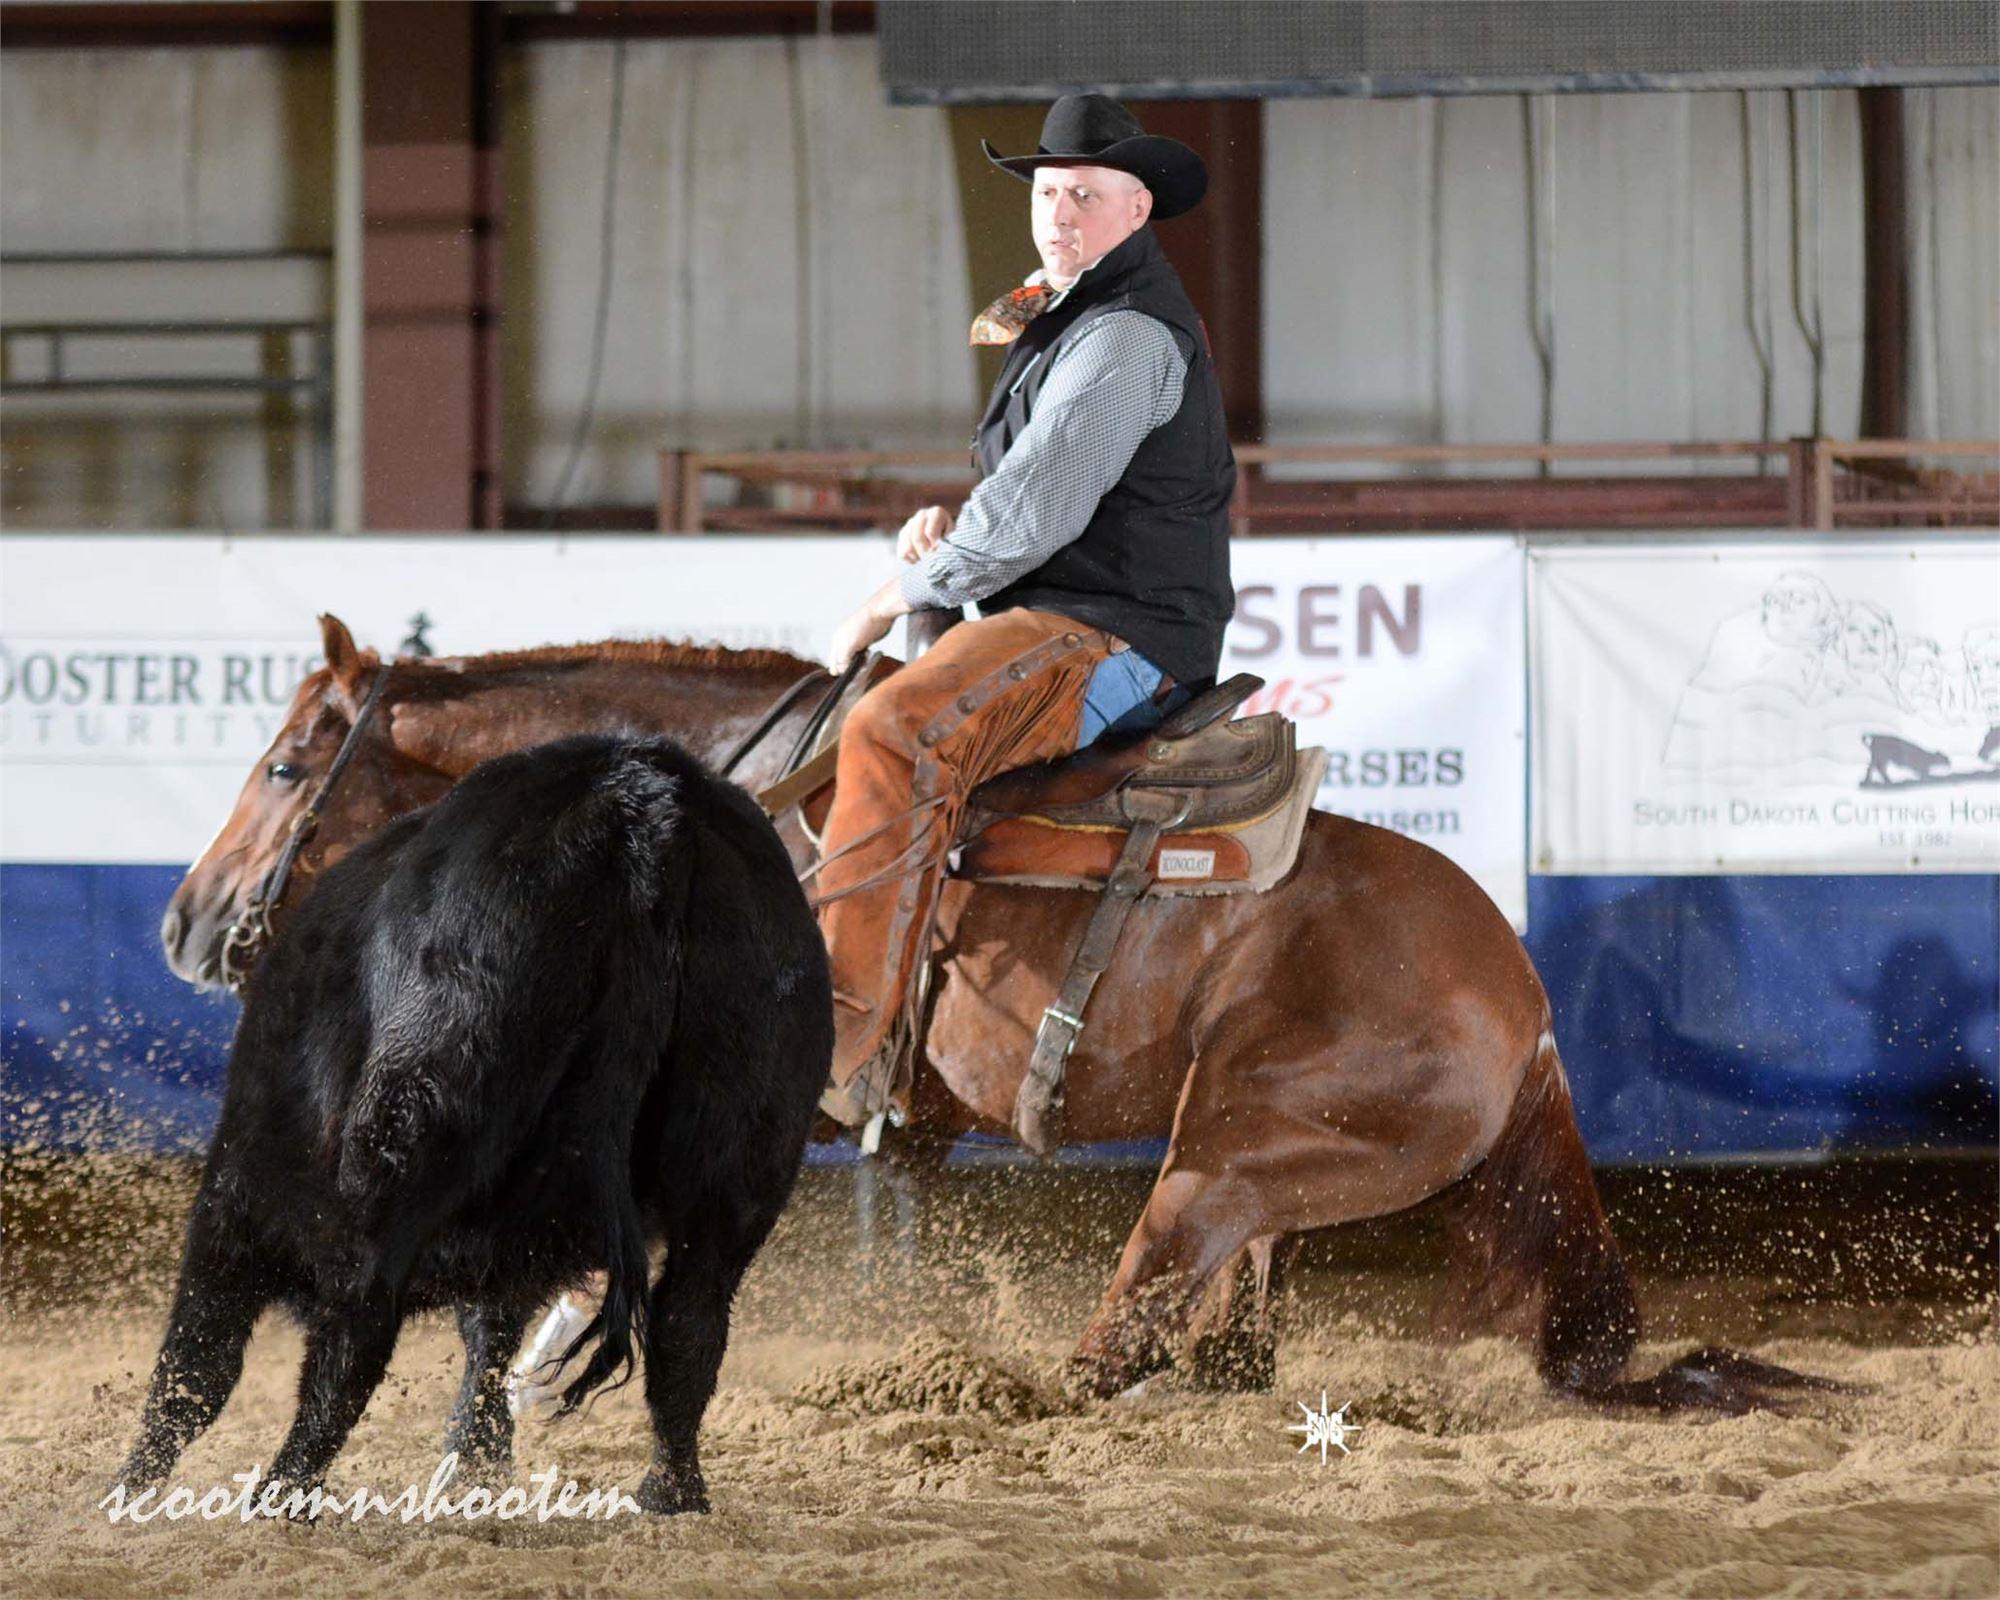 South Dakota Cutting Horse Assoc  Show